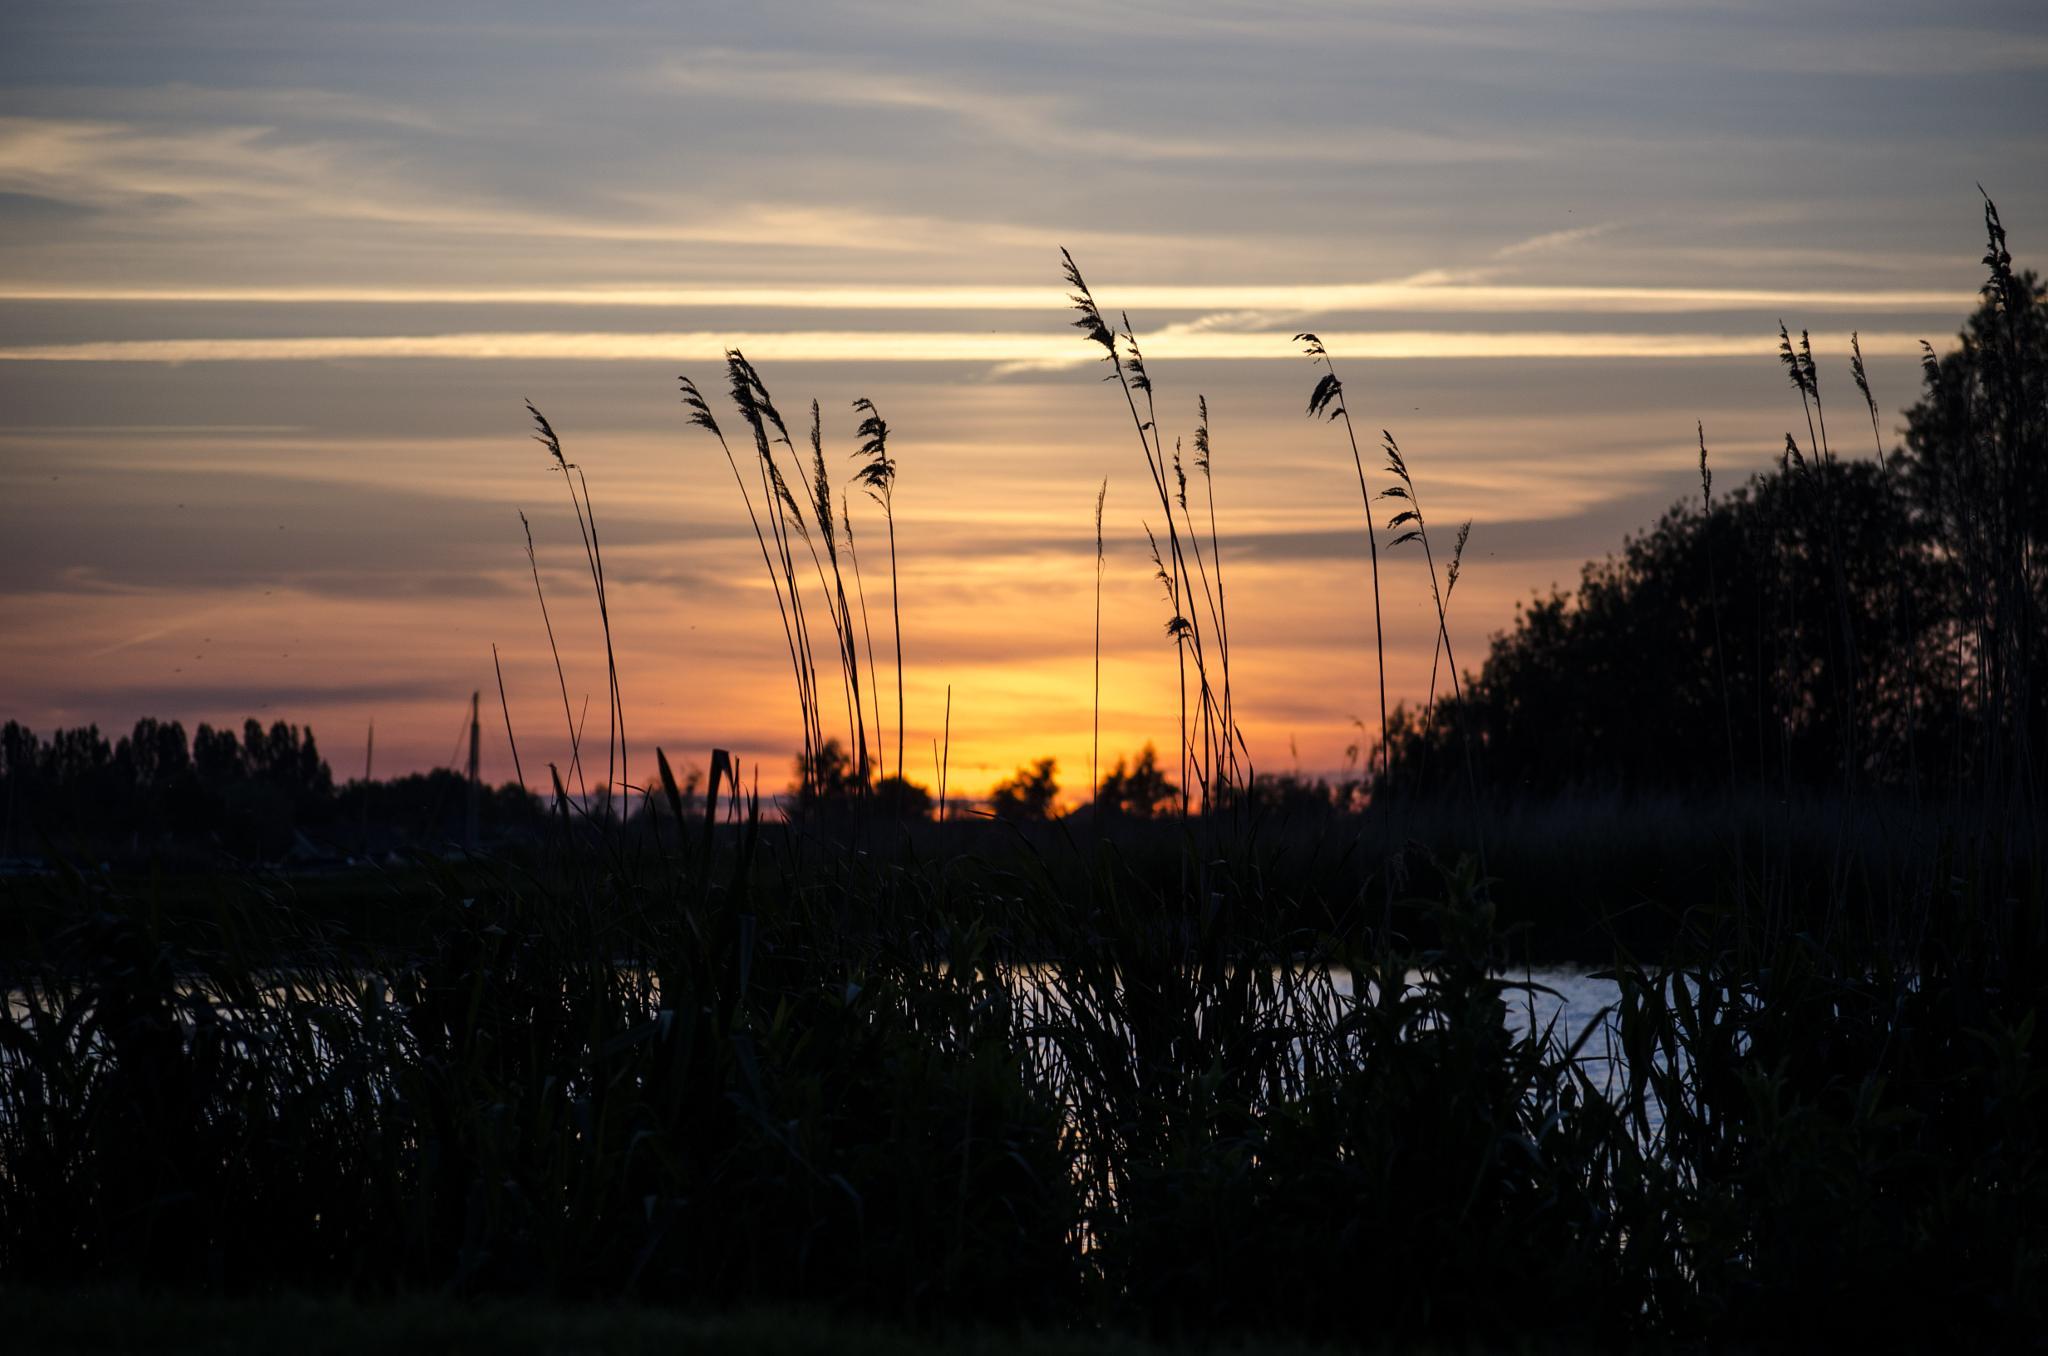 Lake Side sundown by Ibuller